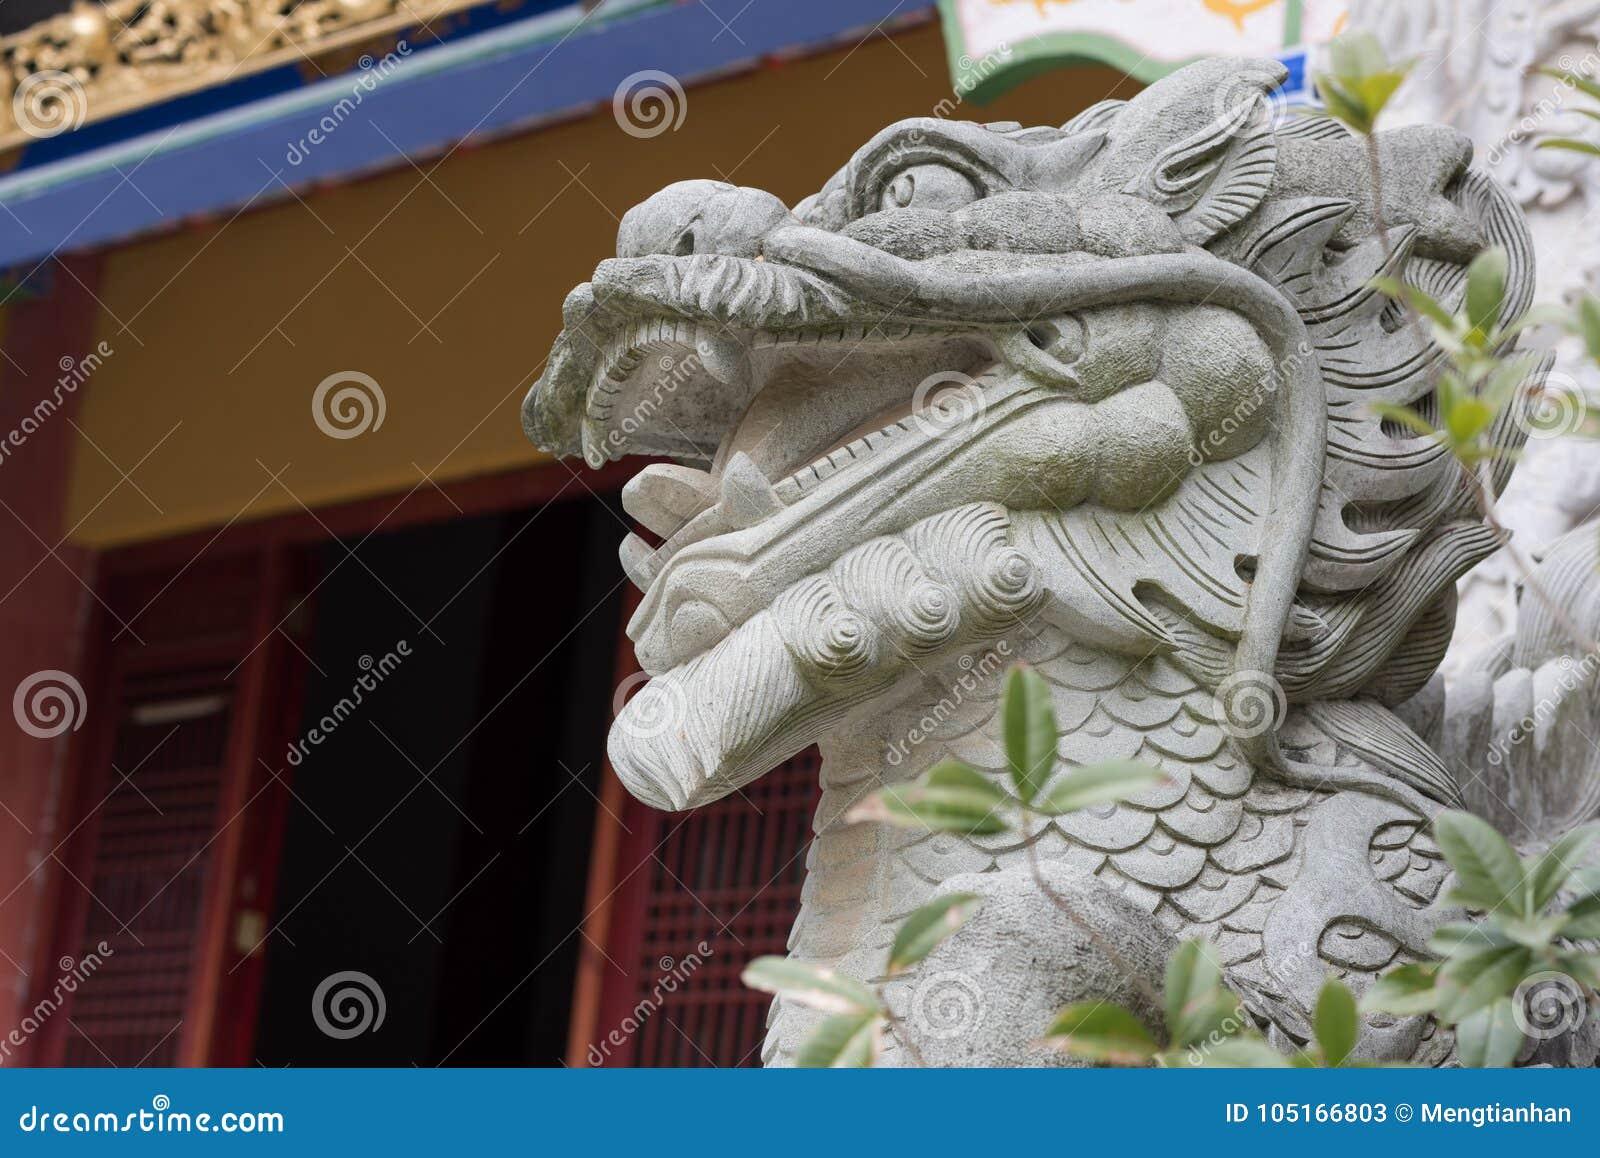 Animal classique de Kylin Chine